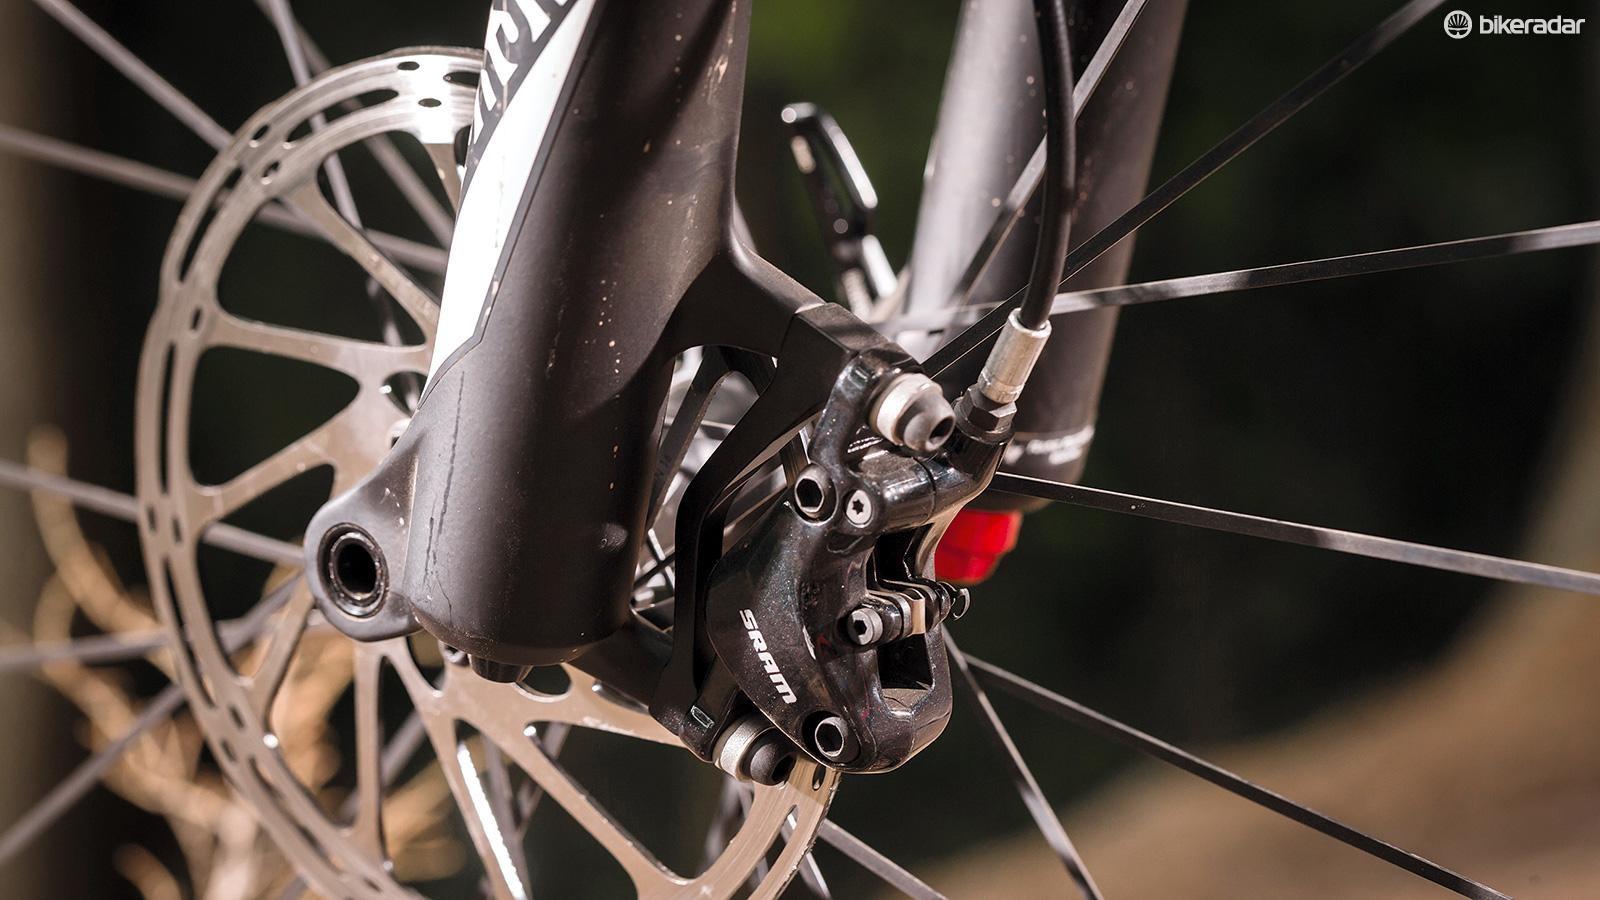 SRAM's budget DB5 brakes perform surprisingly well